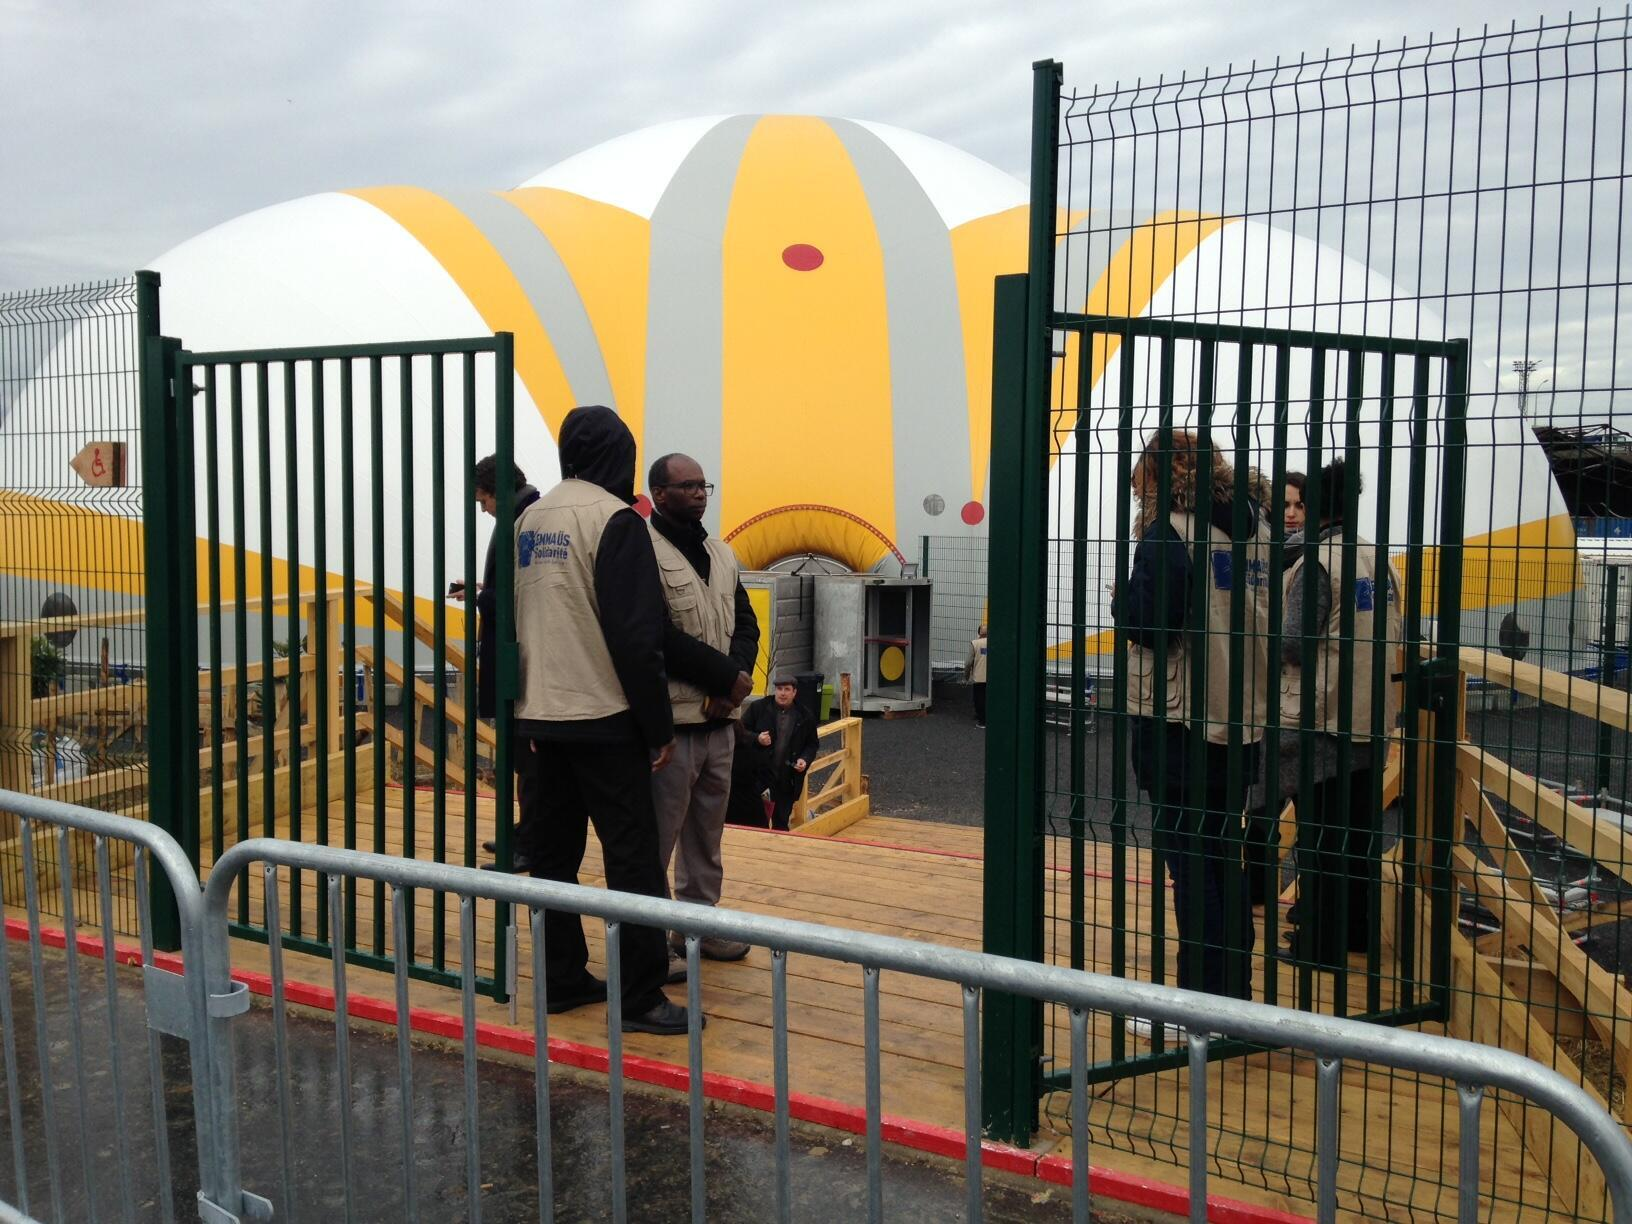 The Paris refugees' camp on Thursday